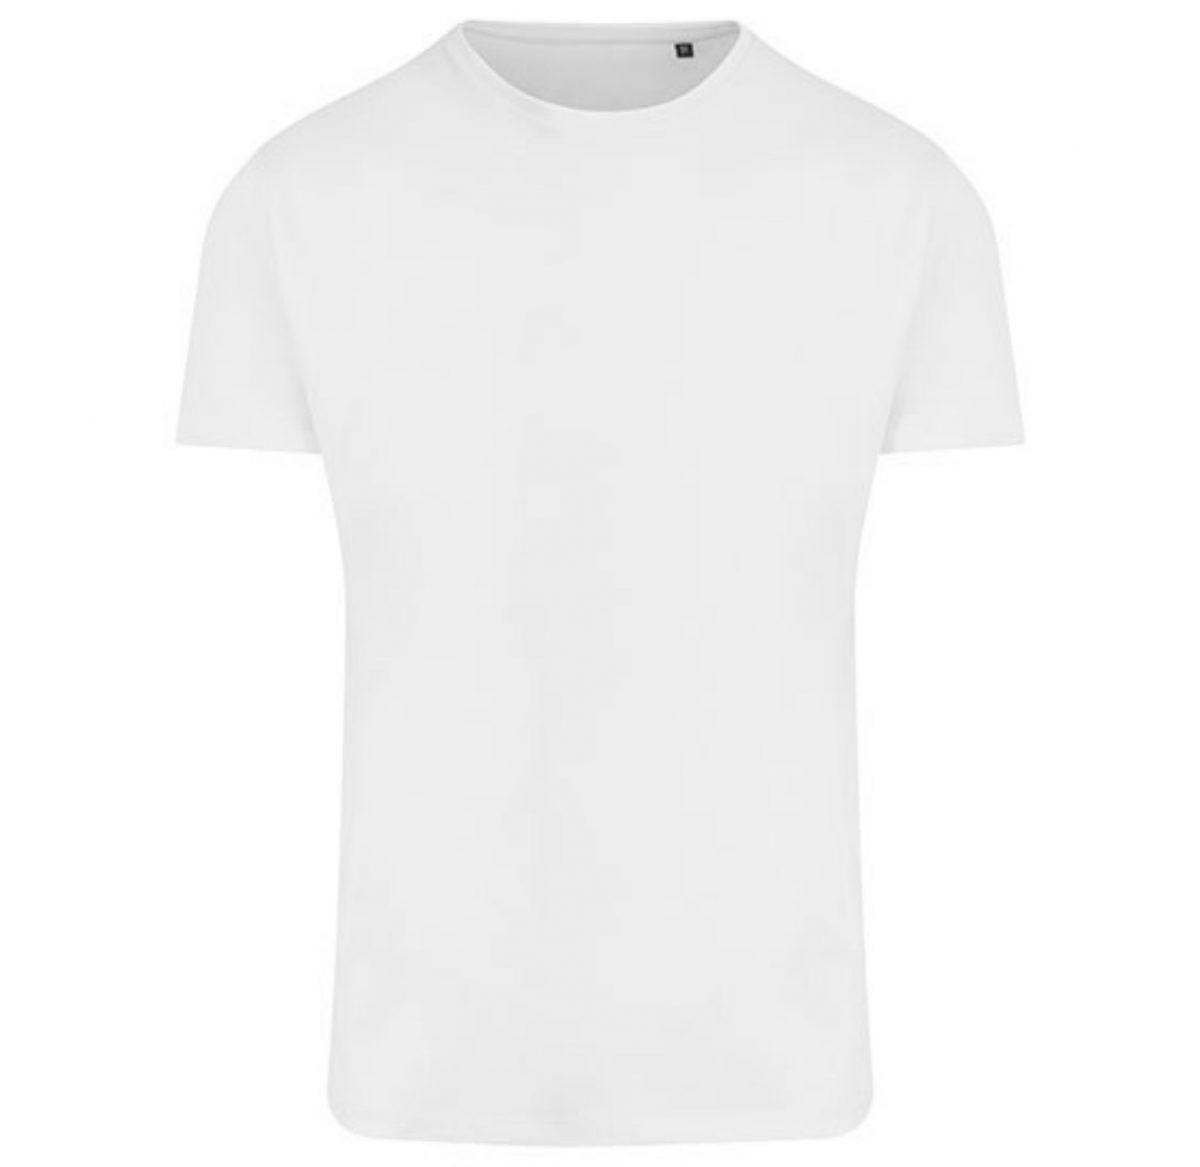 Tee-Shirt Homme Performance – Blanc